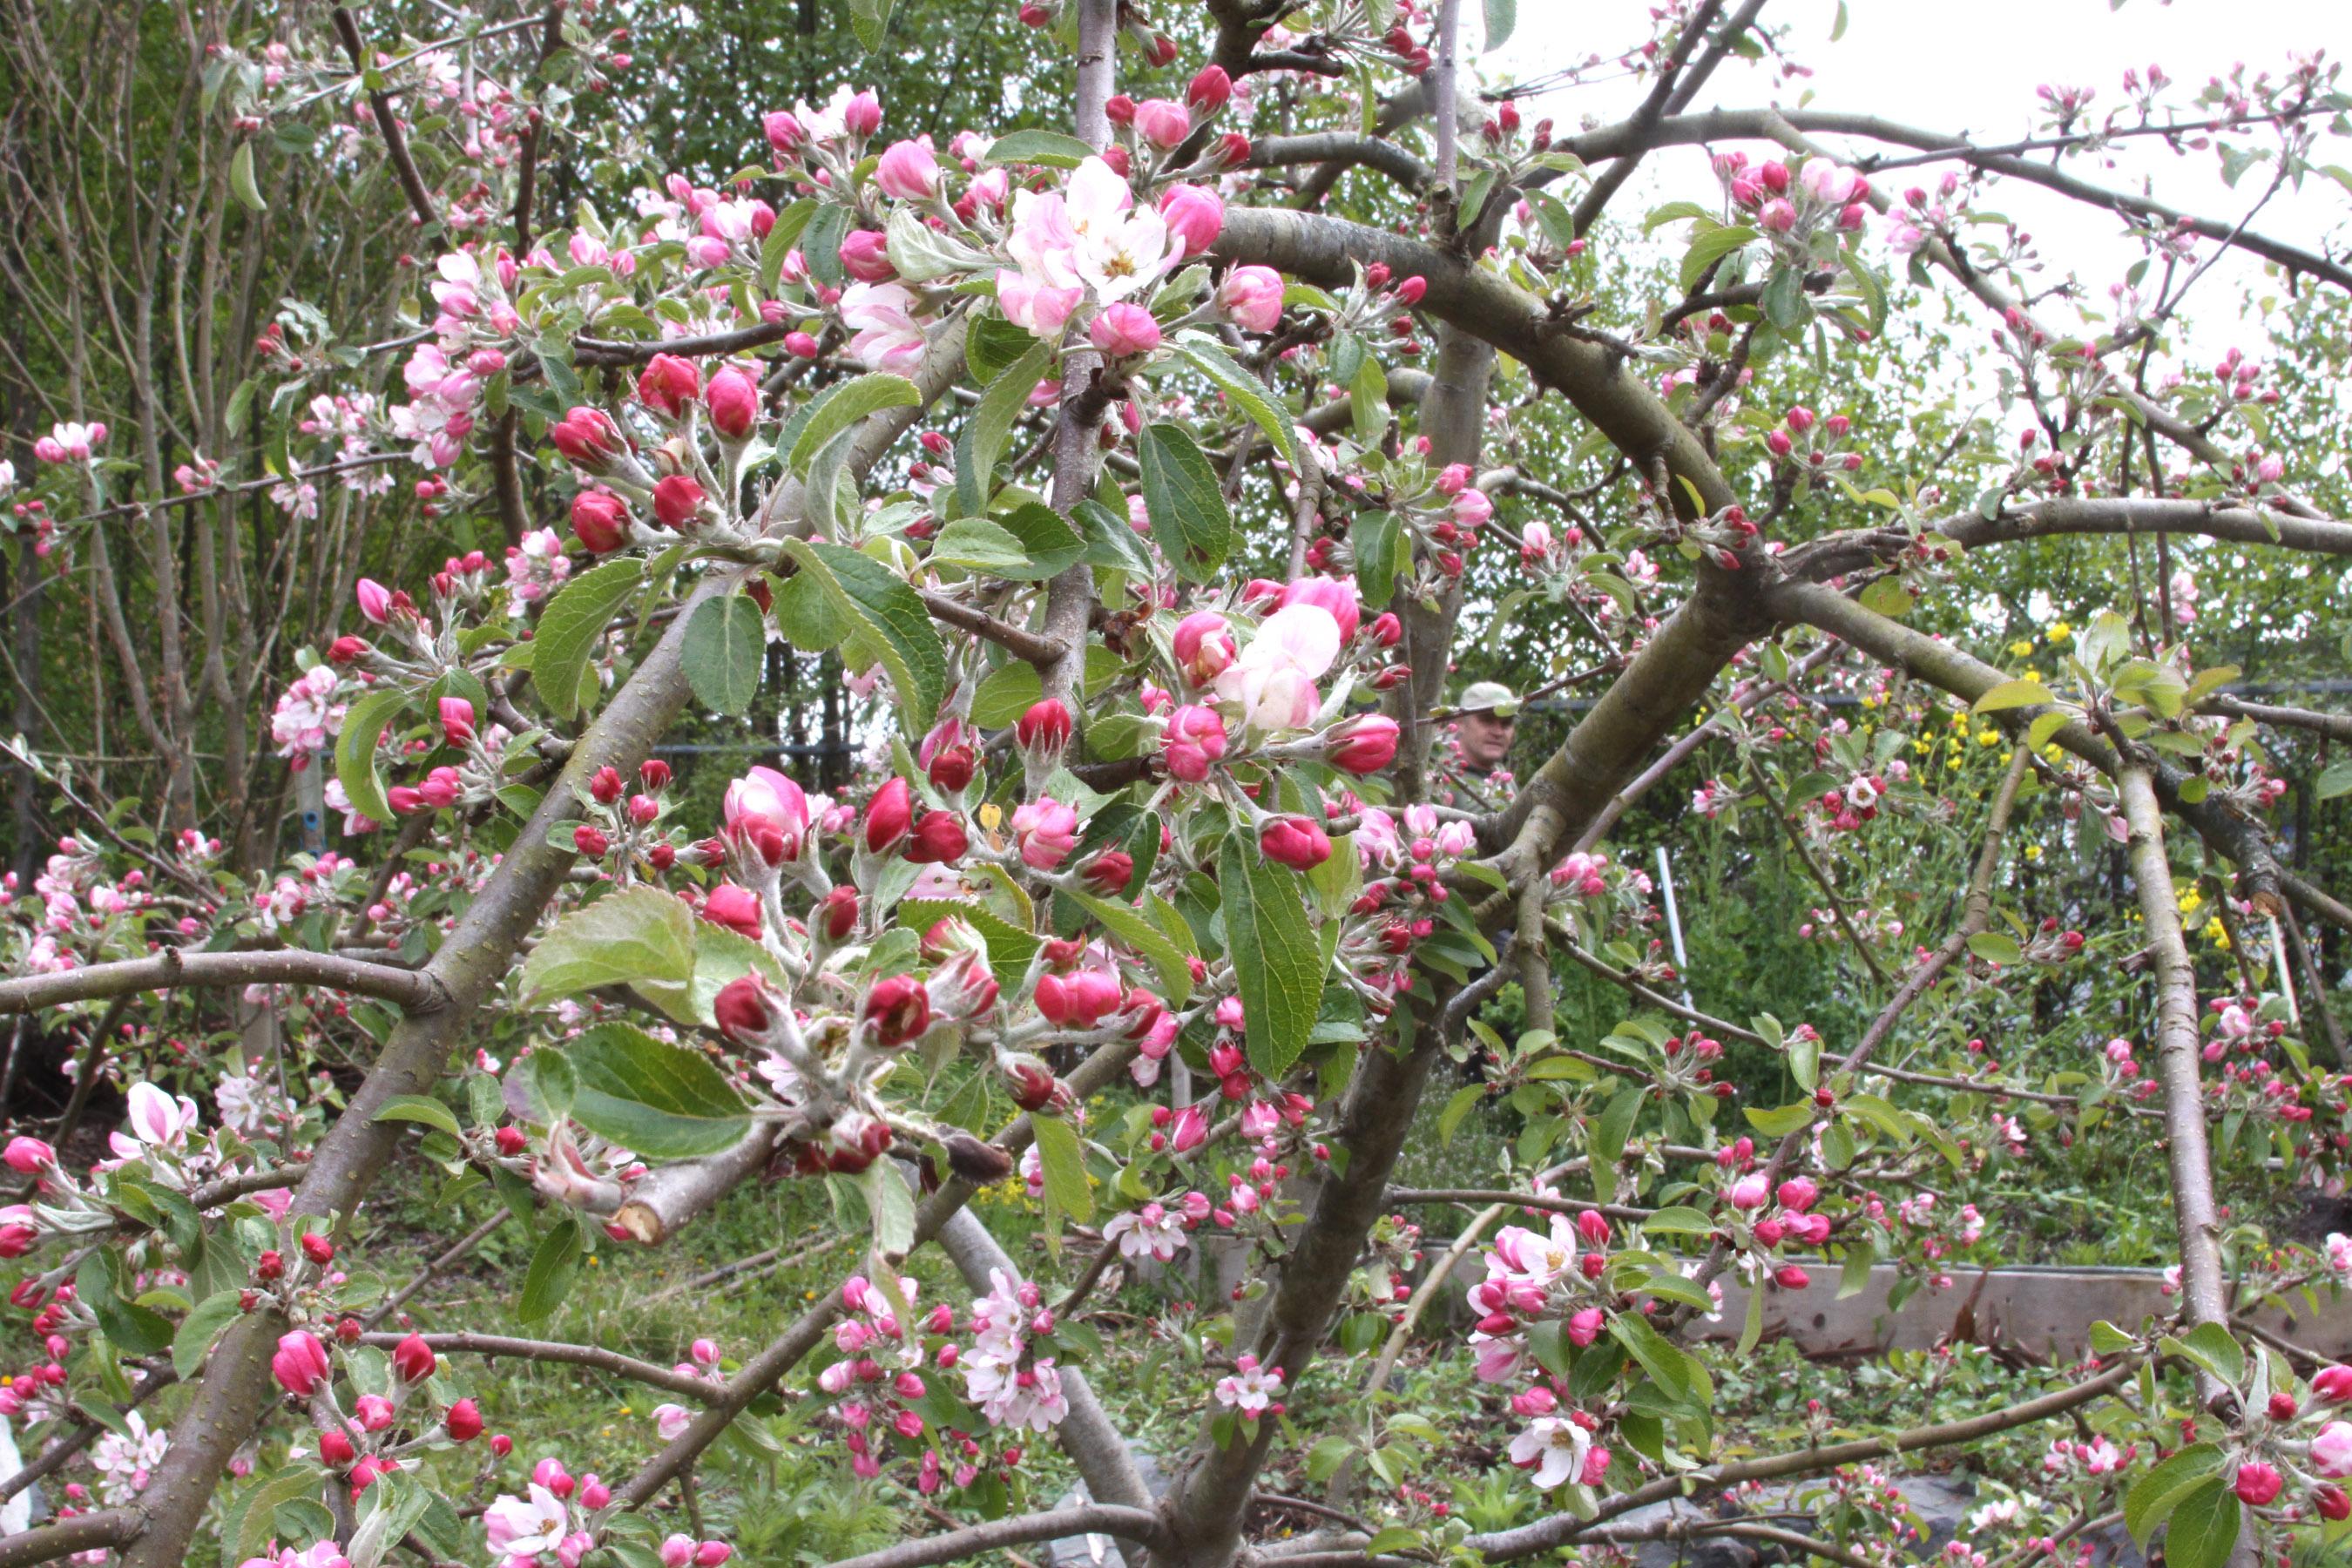 Fruit Trees In Bloom The Produce Nerd